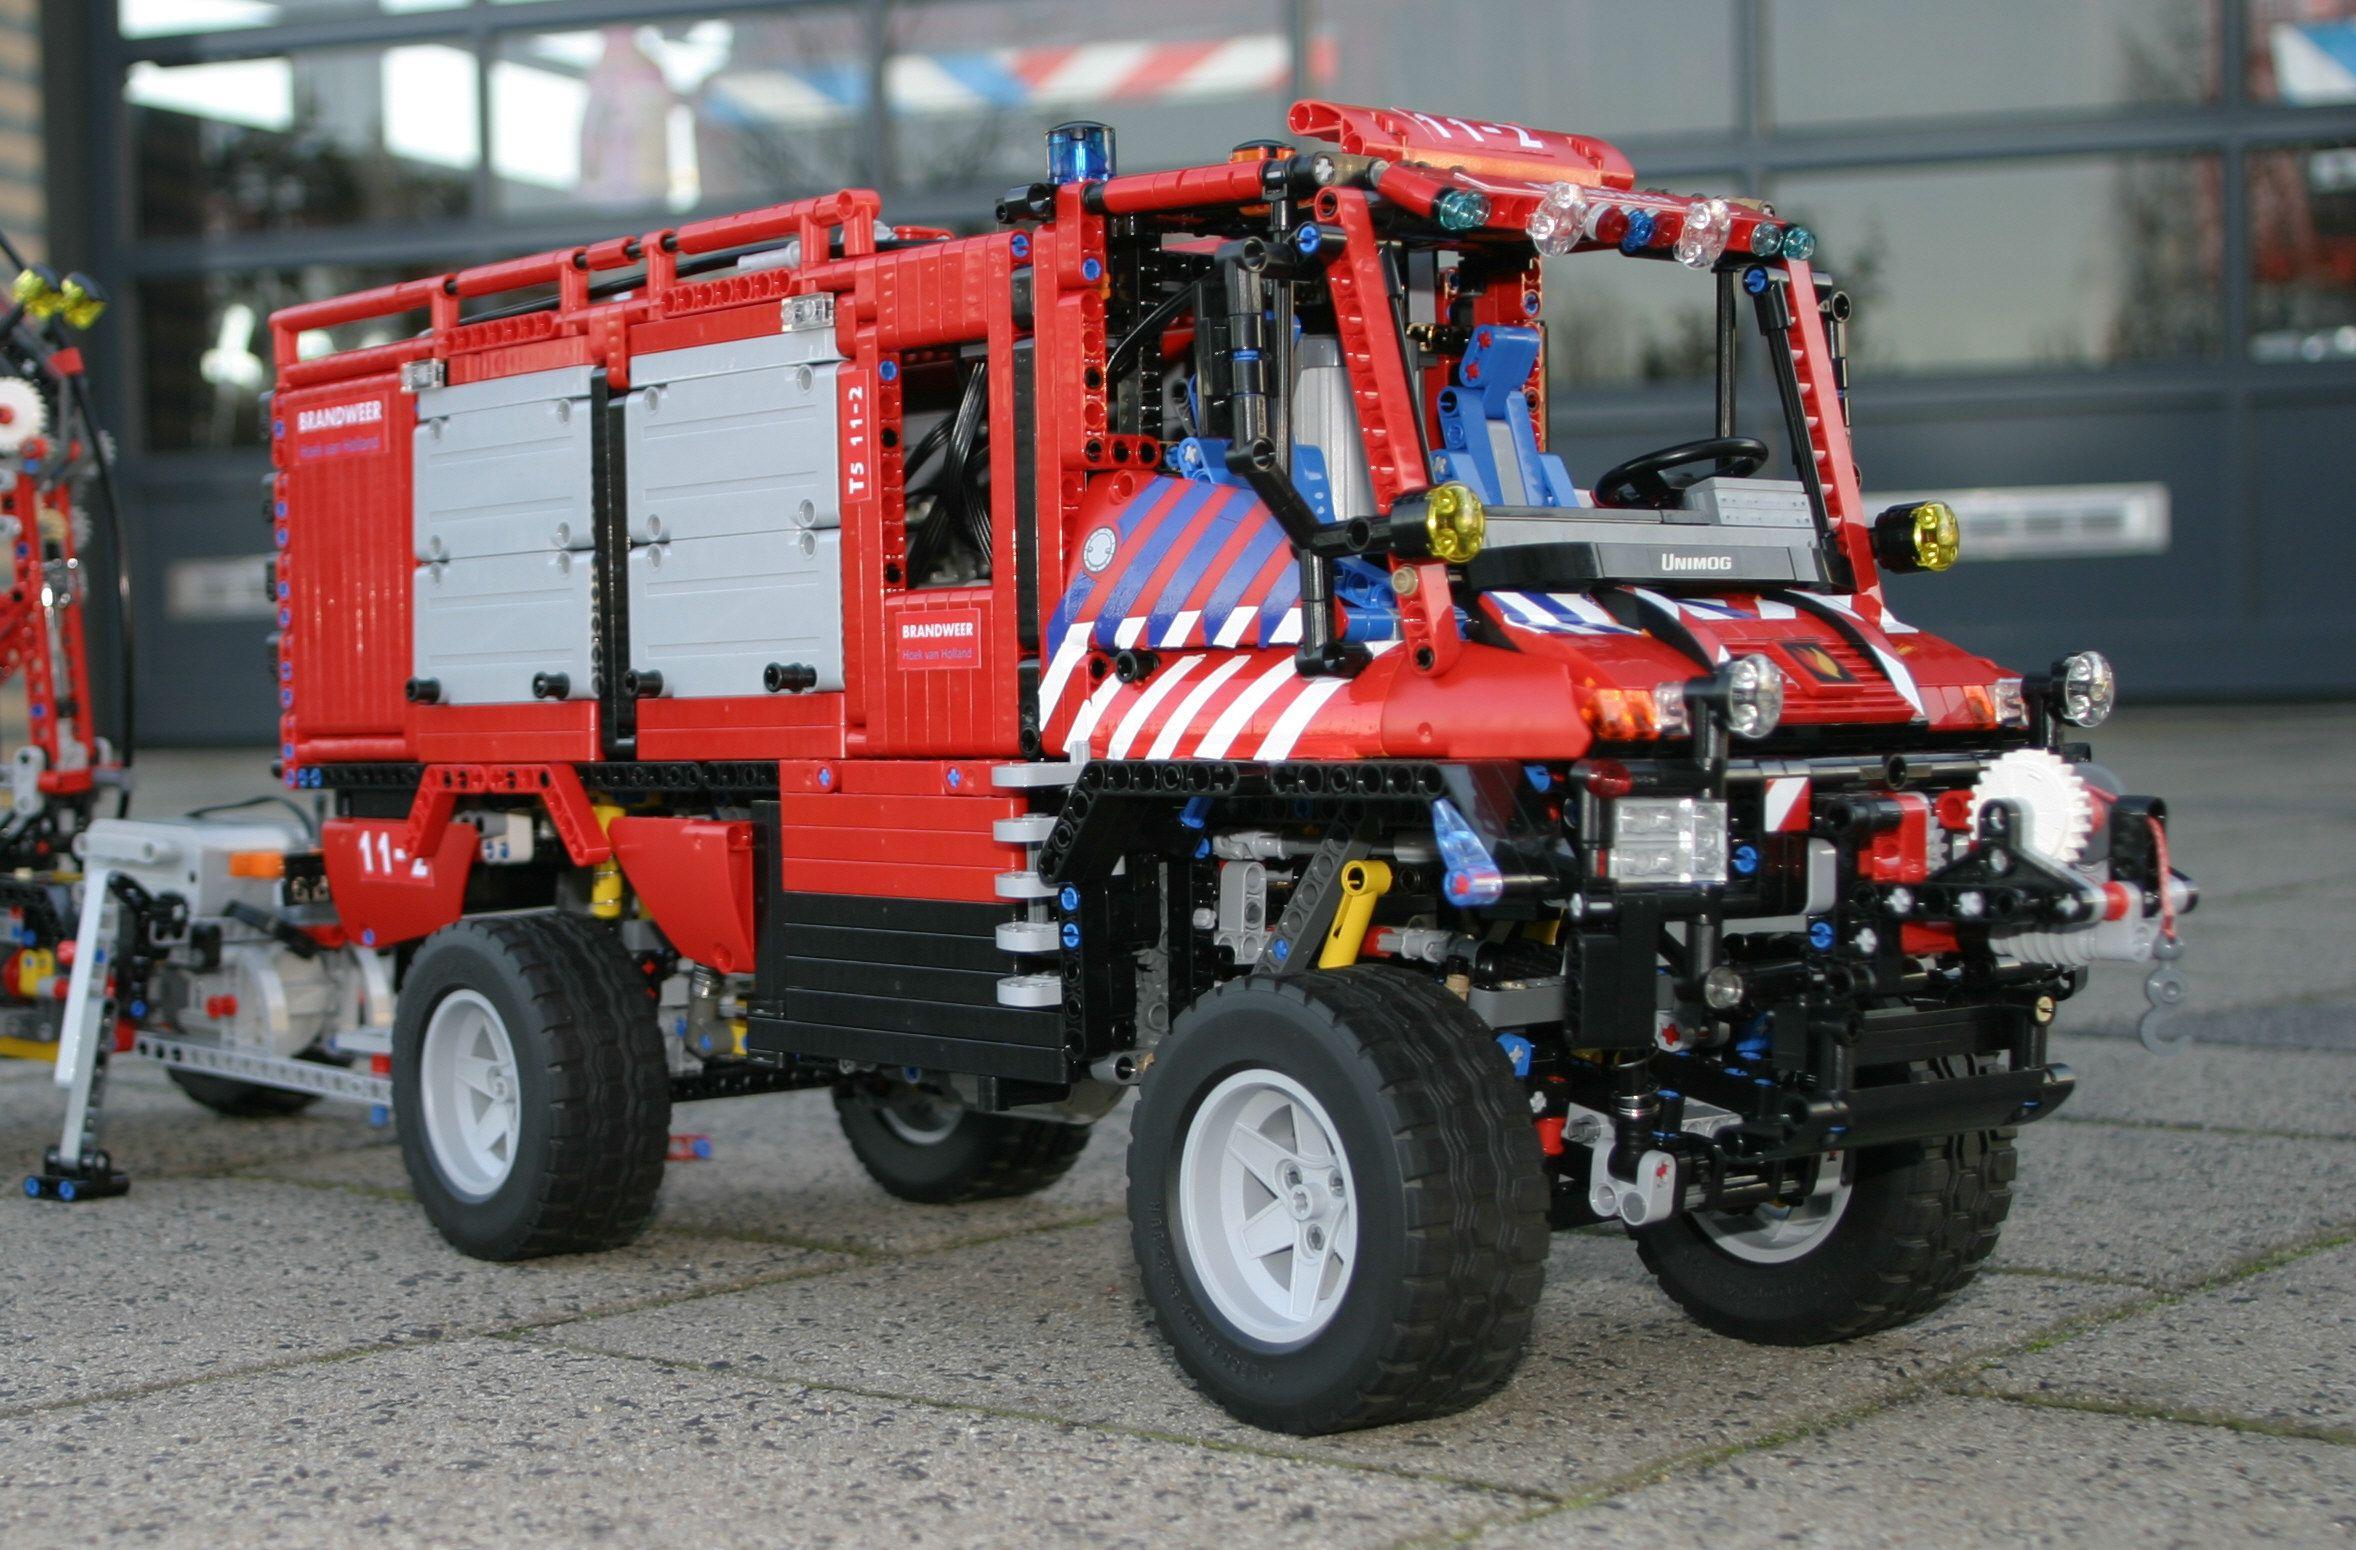 lego unimog u400 fire truck lego camion pinterest unimog u400 lego and lego technic. Black Bedroom Furniture Sets. Home Design Ideas